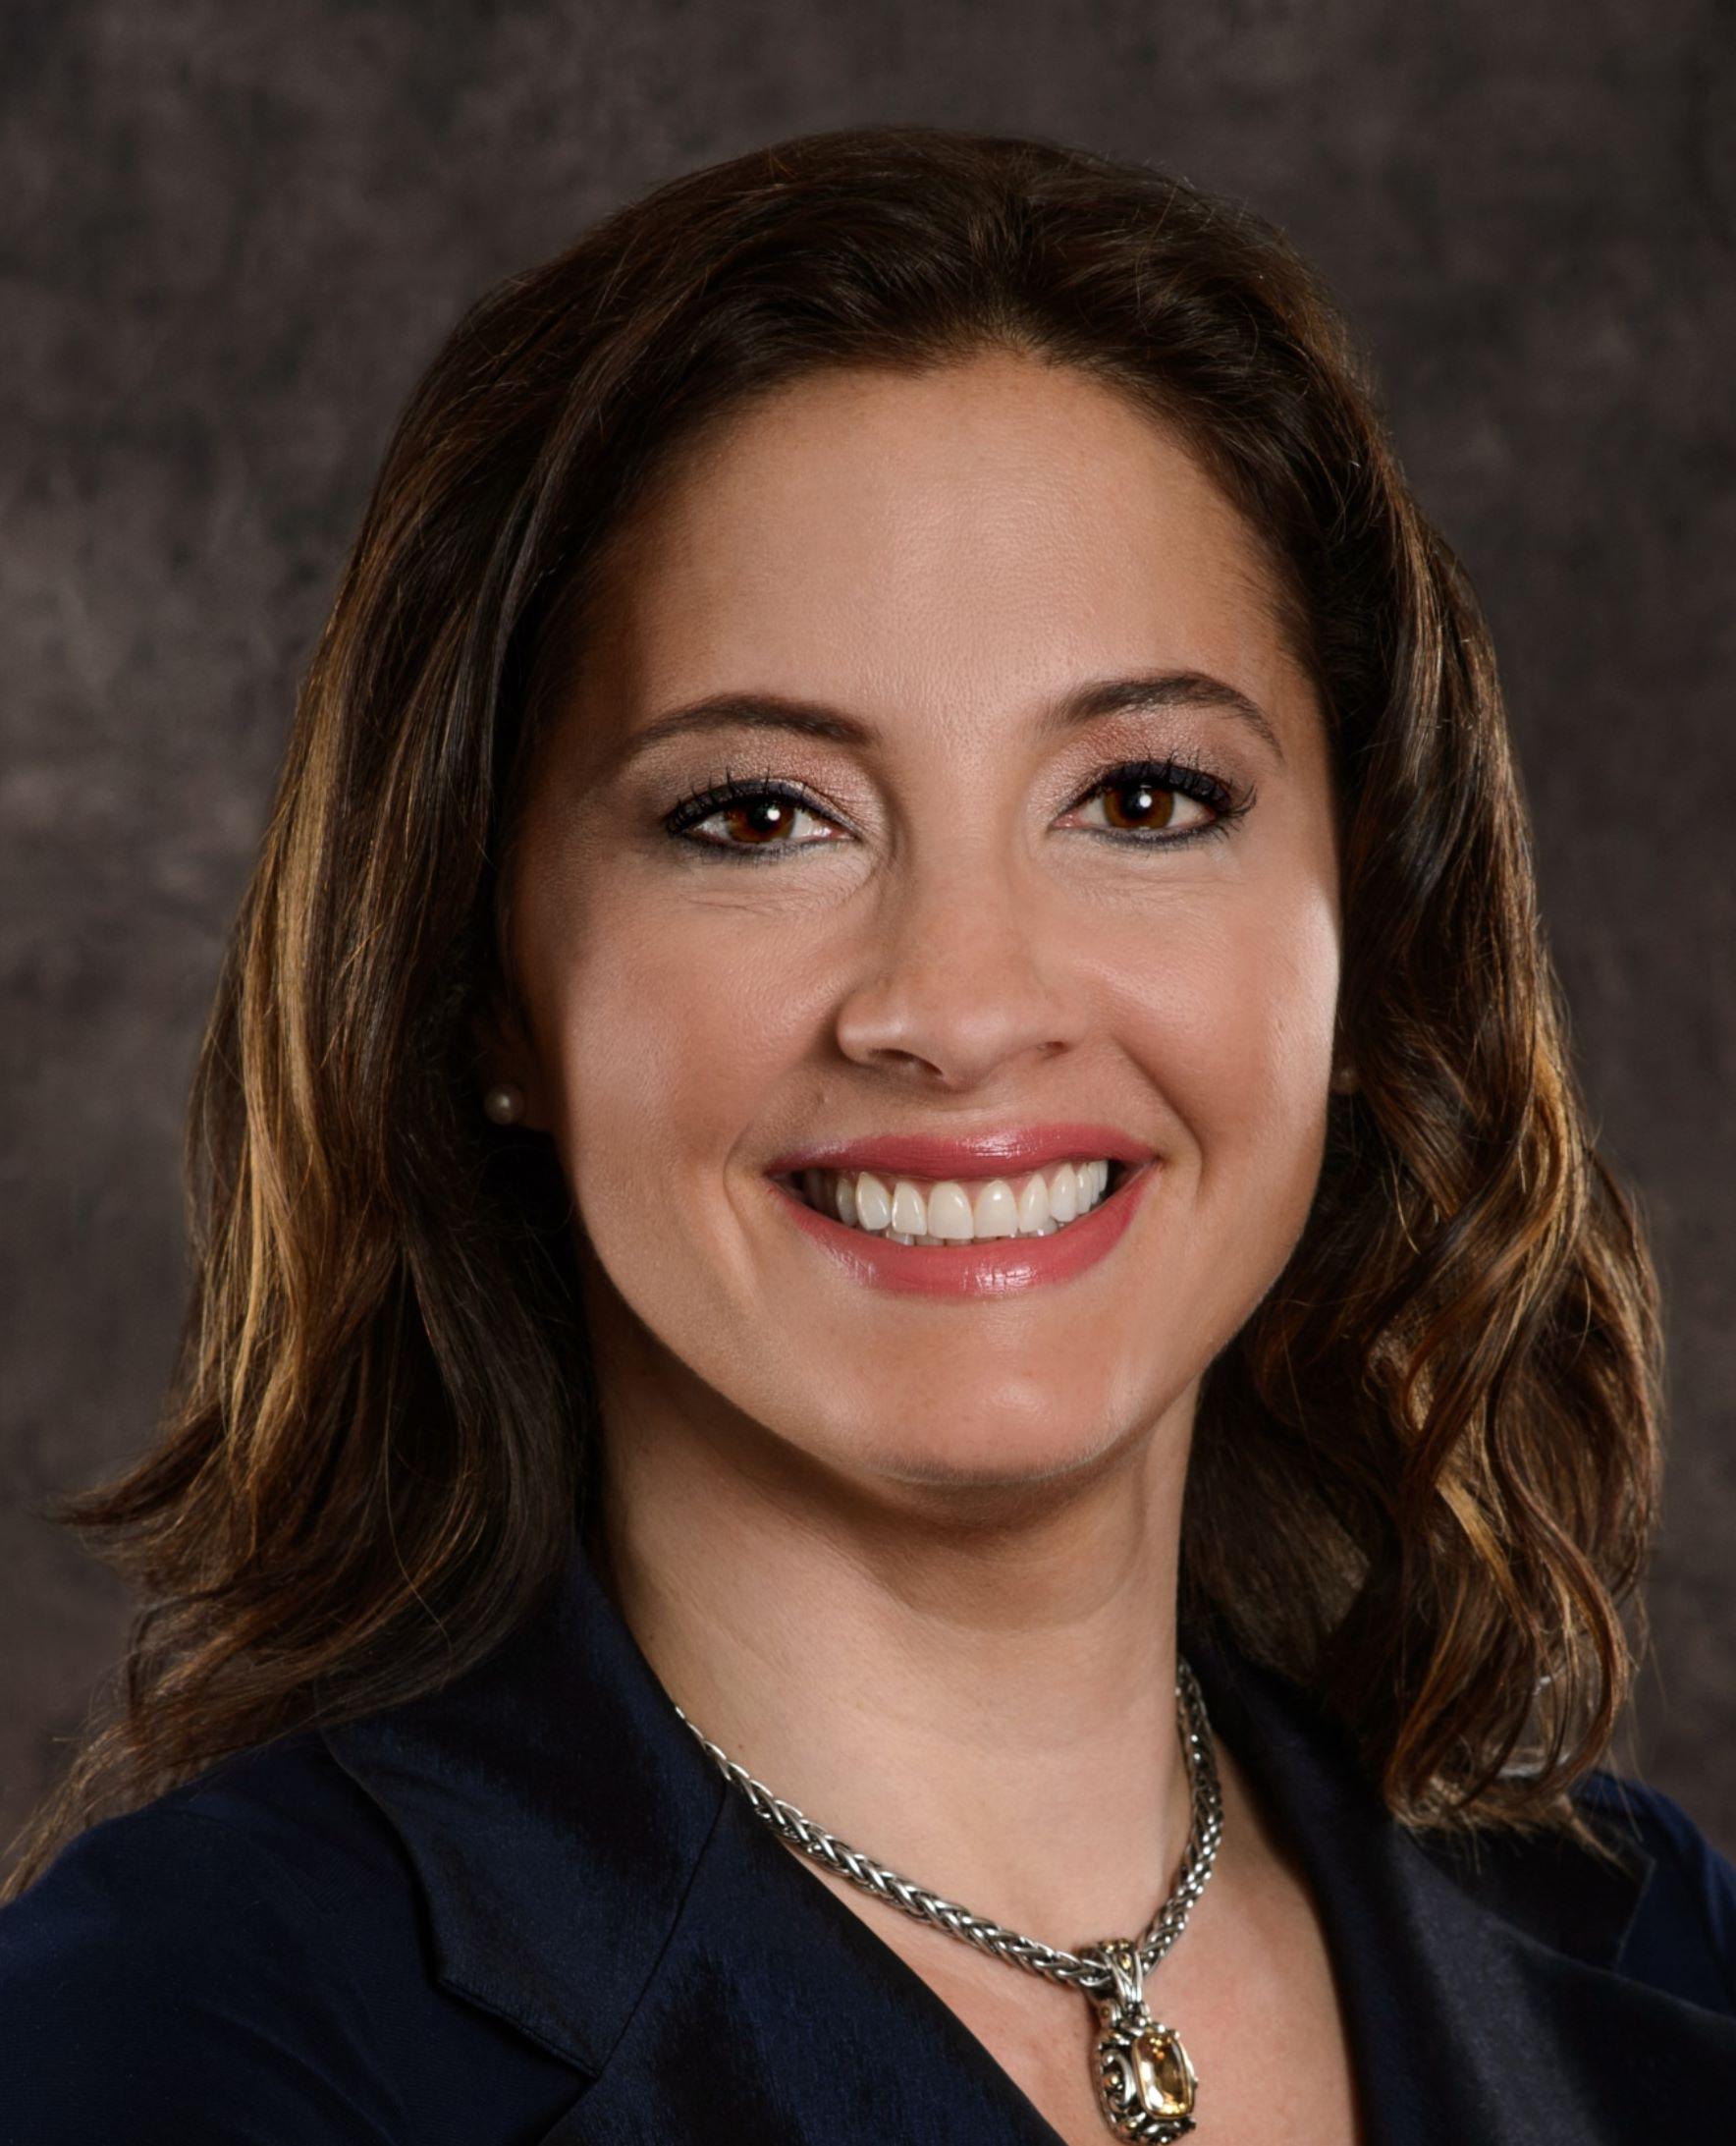 Shana Lurie